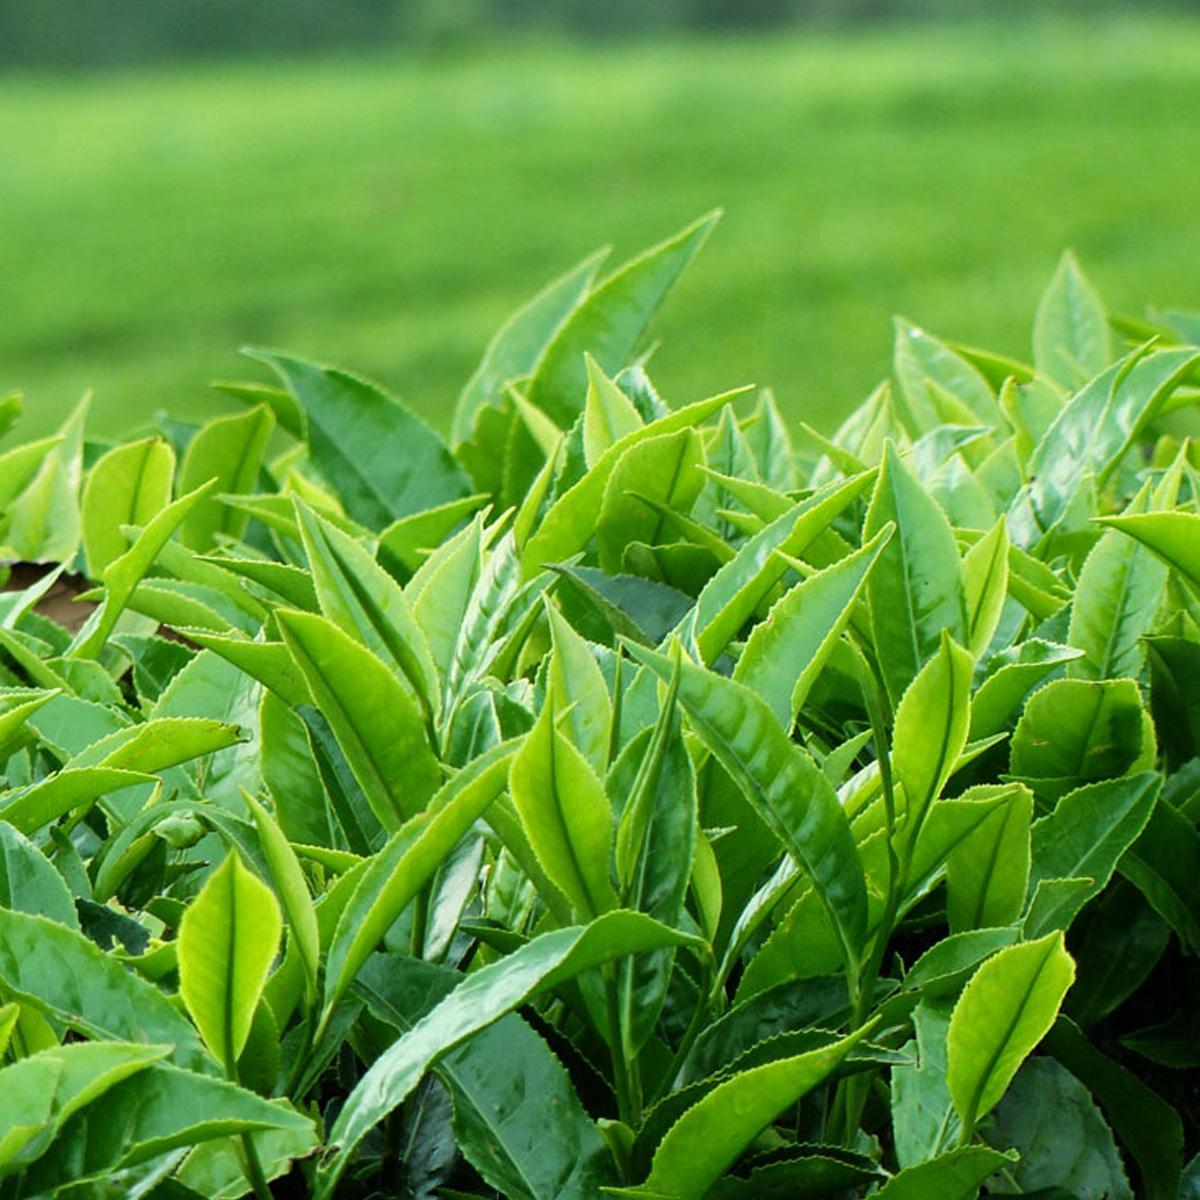 Çay Üreticisine Serbestlik Sevindirdi